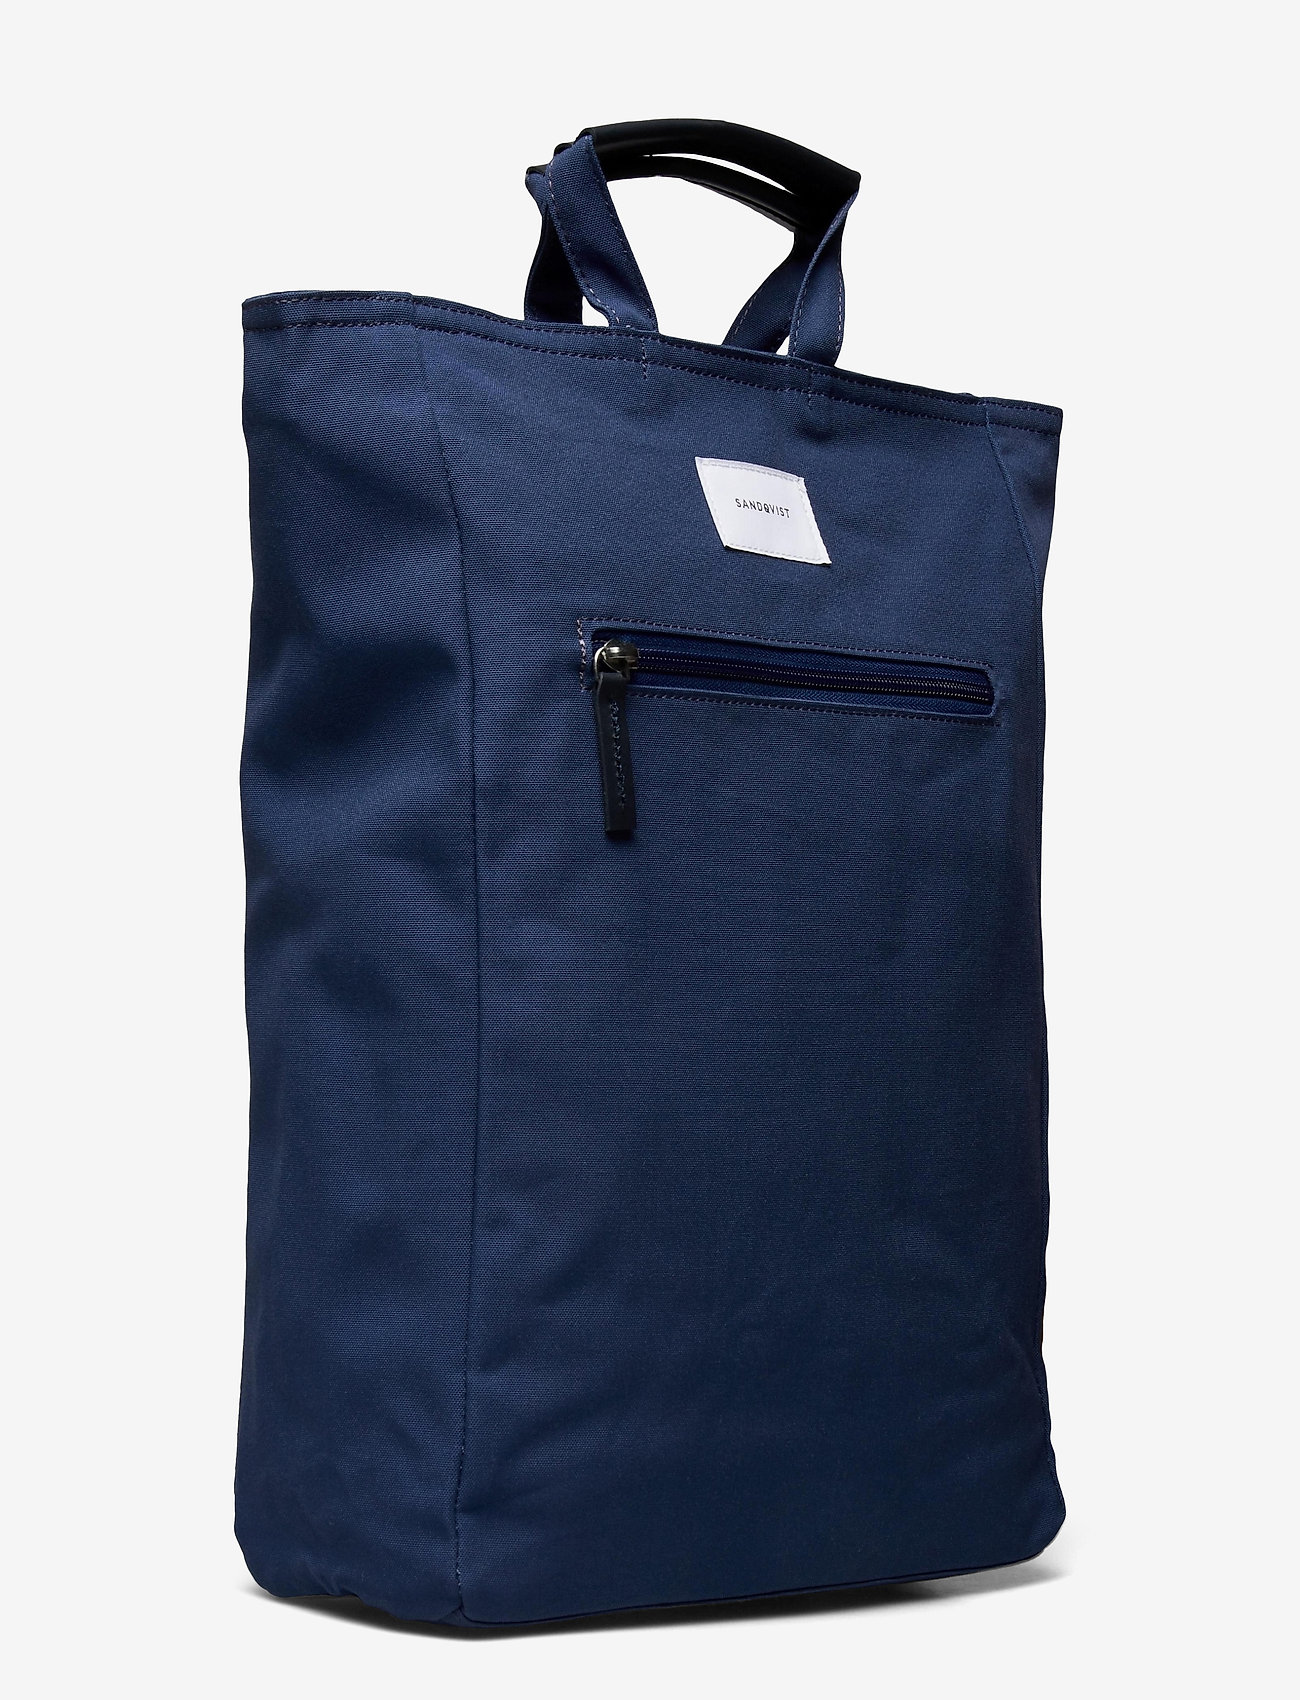 SANDQVIST - TONY - sacs a dos - blue with blue leather - 2